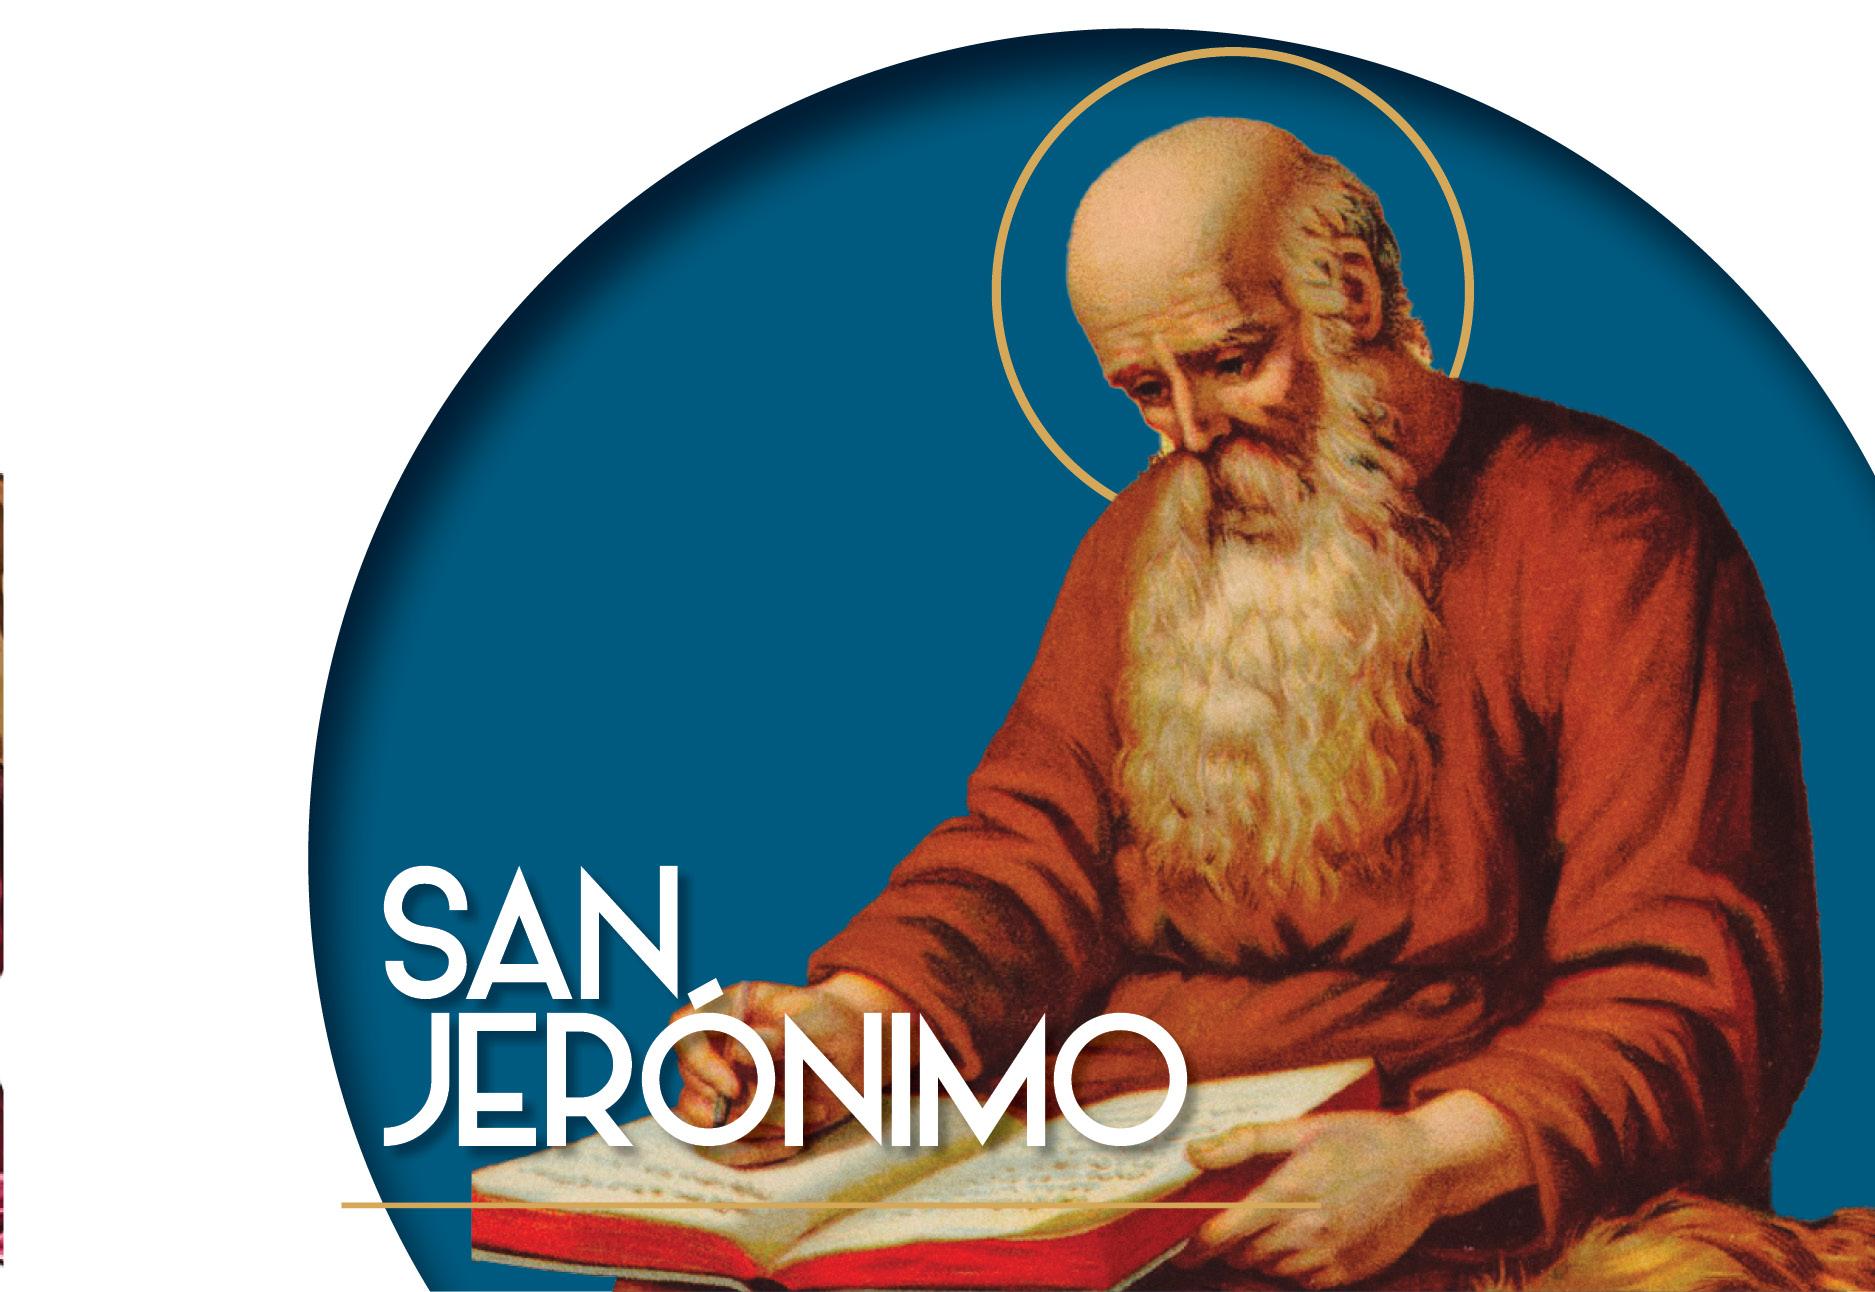 San Jerónimo